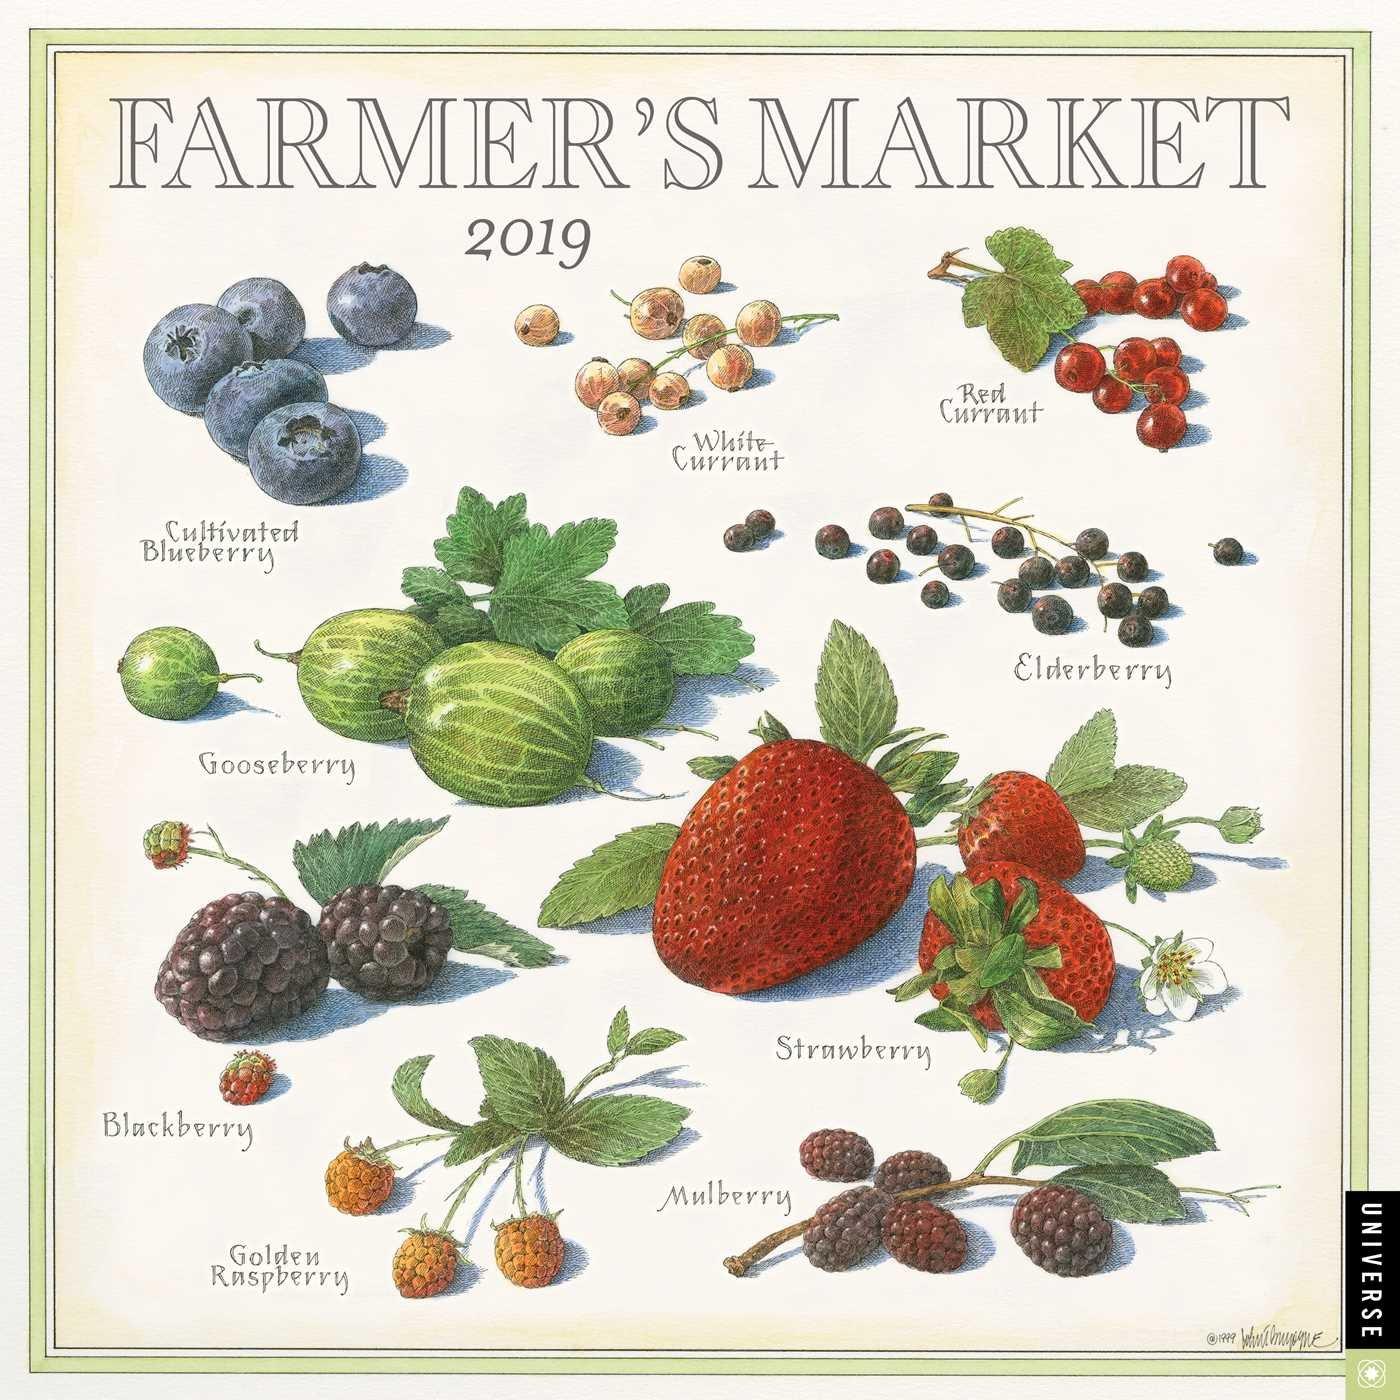 Market Calendar 2019 Farmer's Market 2019 Wall Calendar: John Burgoyne: 9780789334930